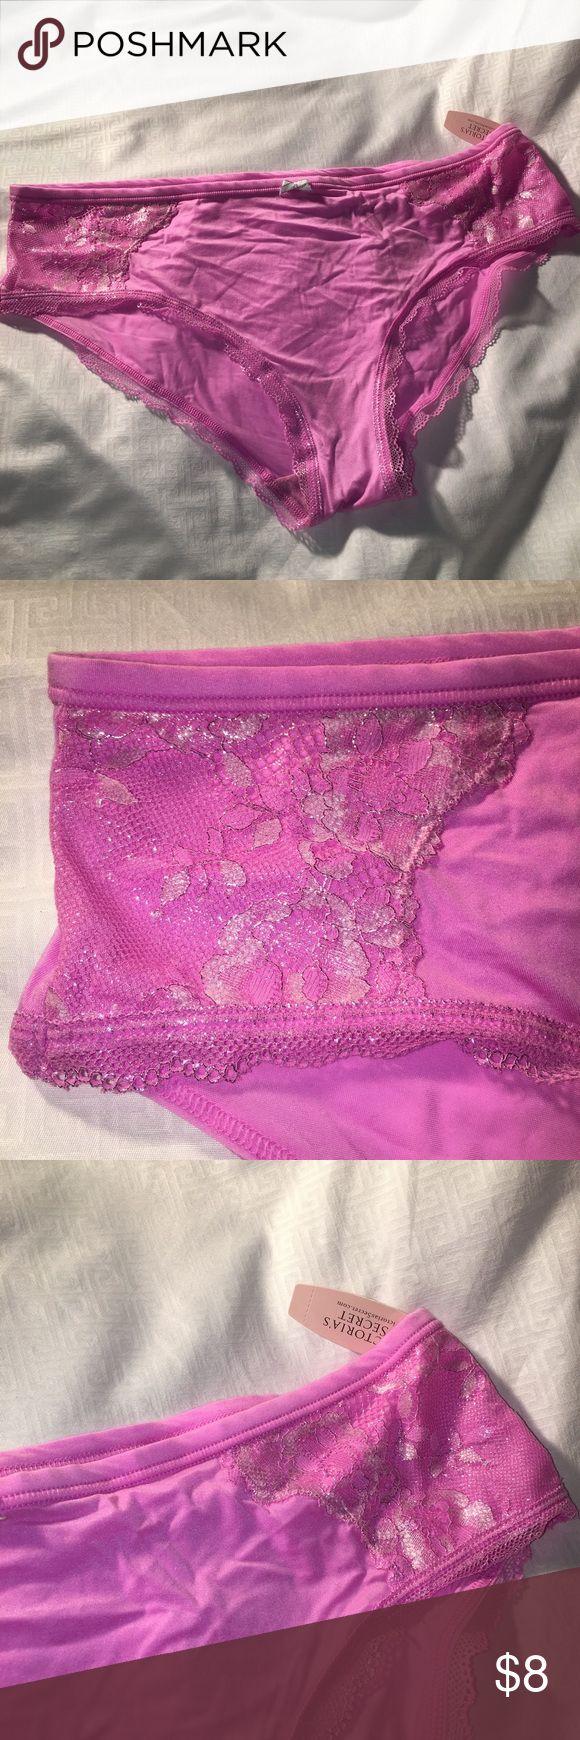 BNWT.. Victoria's Secret Hot Pink LG Panties BNWT.. Victoria's Secret LG Hot Pink Panties. PINK Victoria's Secret Intimates & Sleepwear Panties